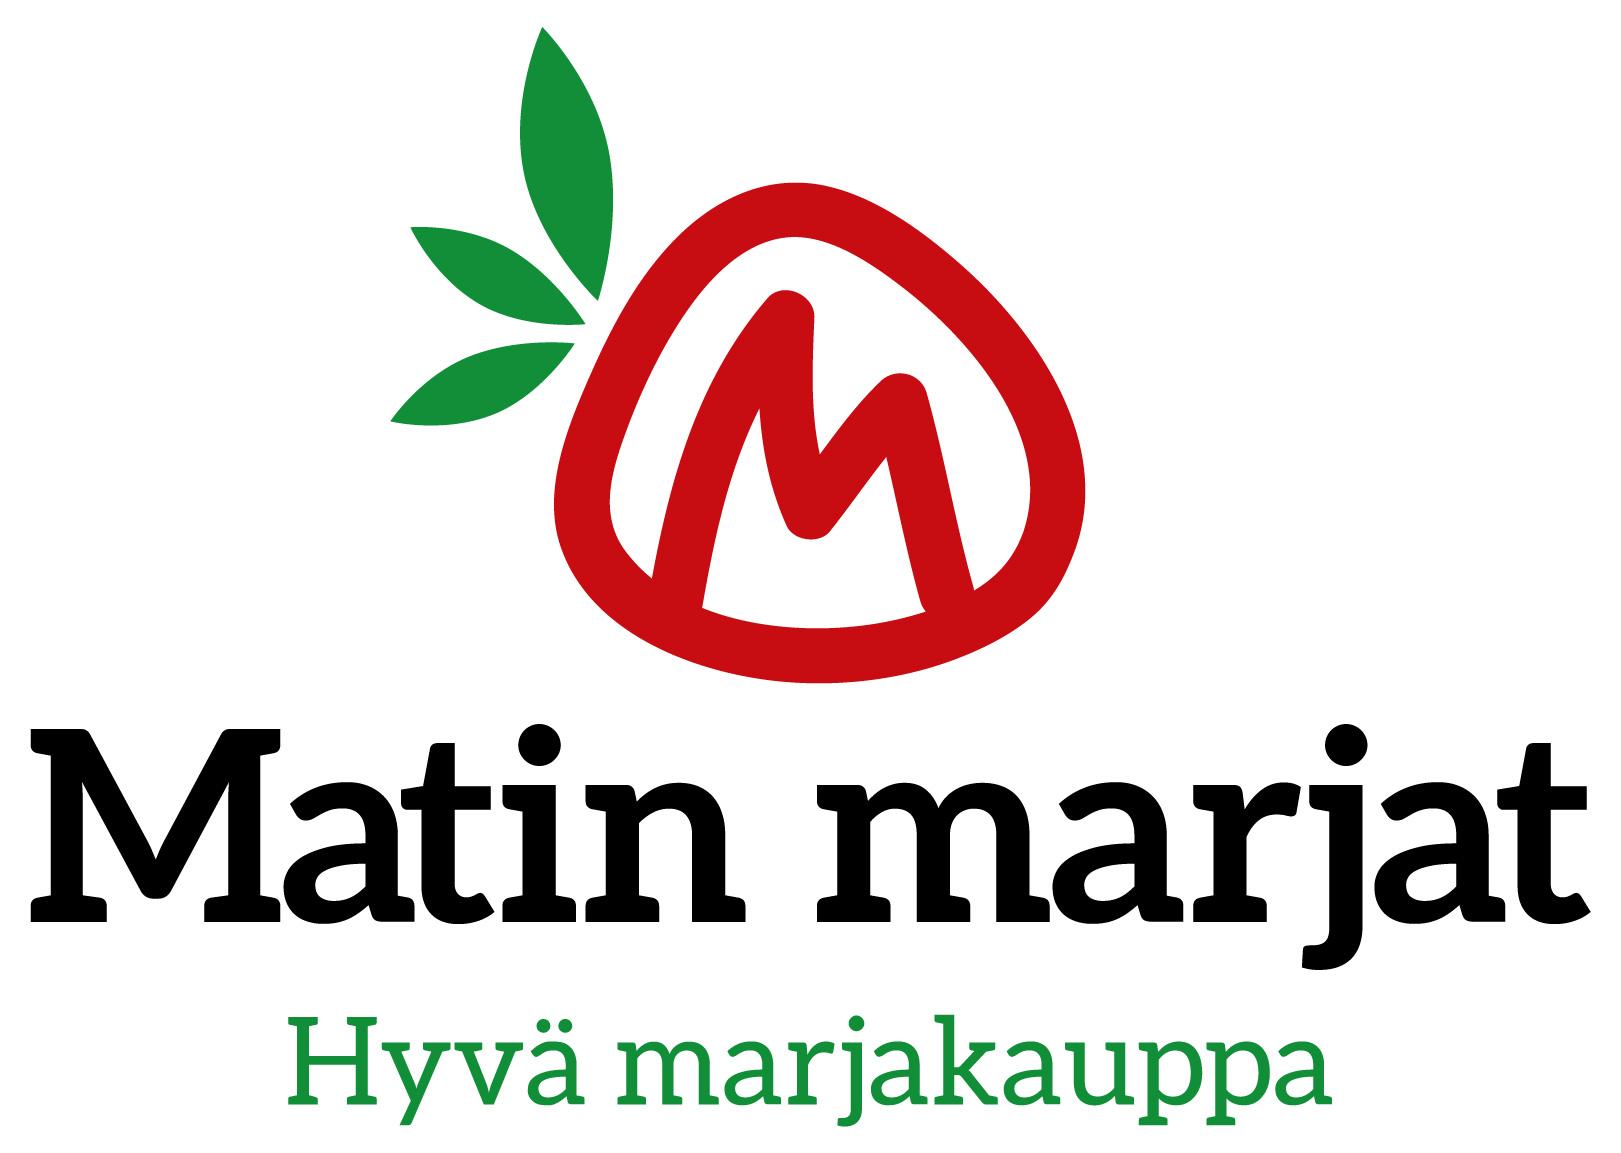 Matin Marjat Oy logo